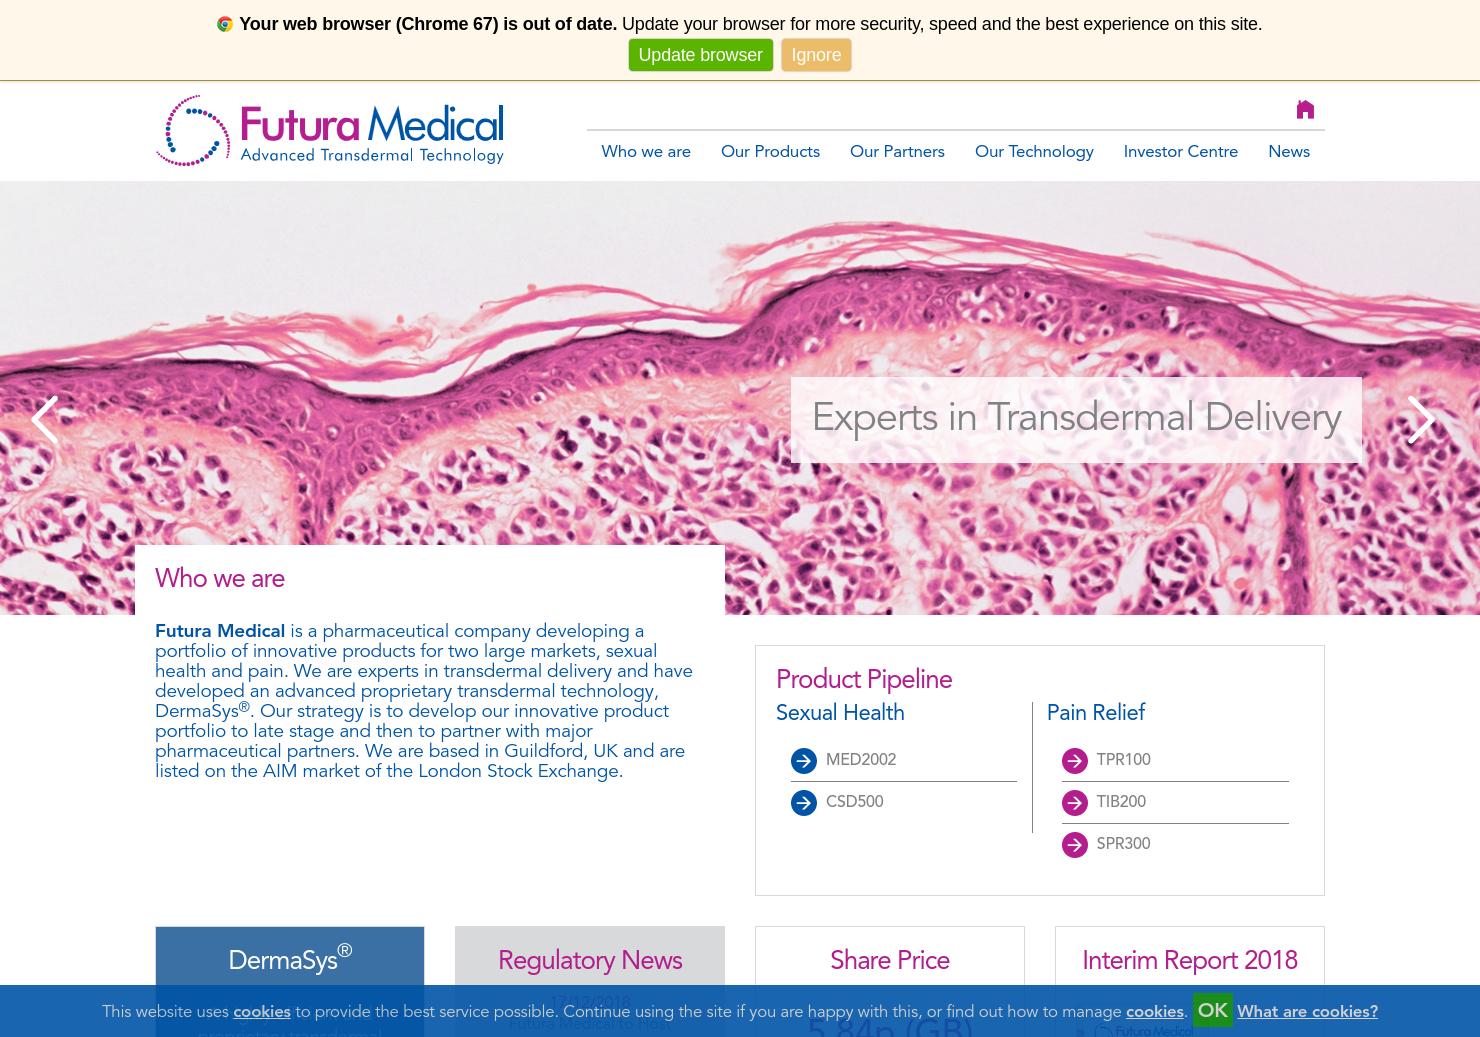 Futura Medical Home Page